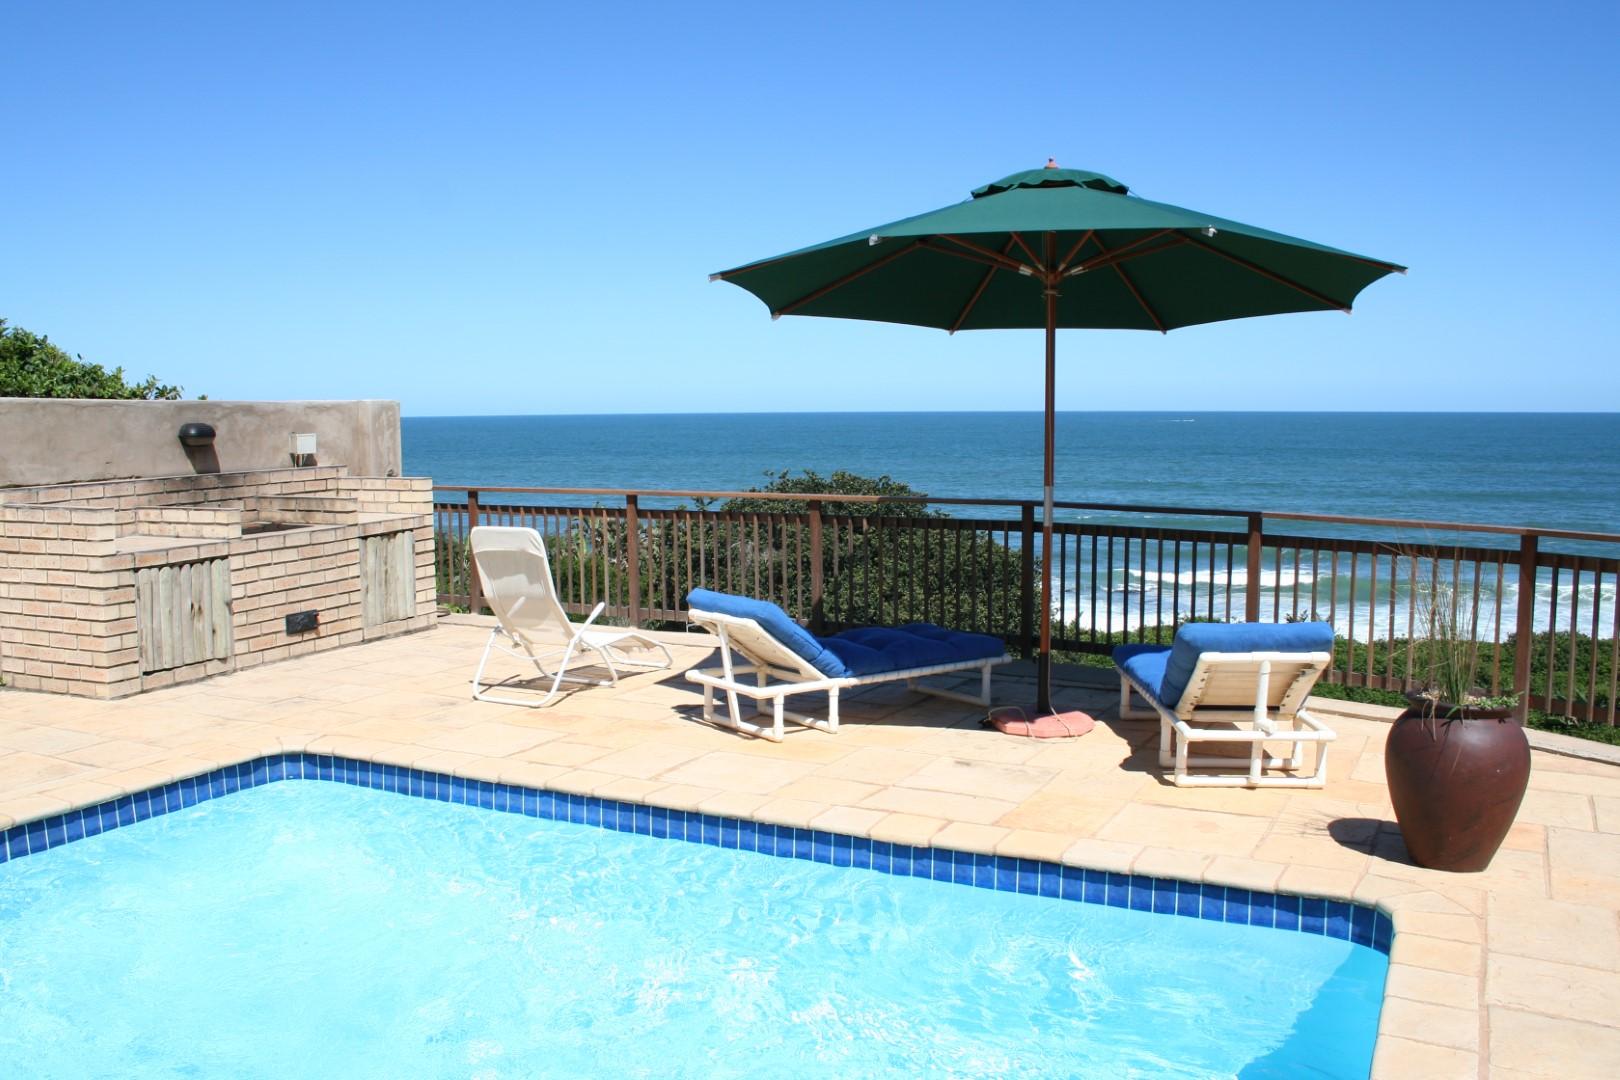 The Ritz Beach Cottage